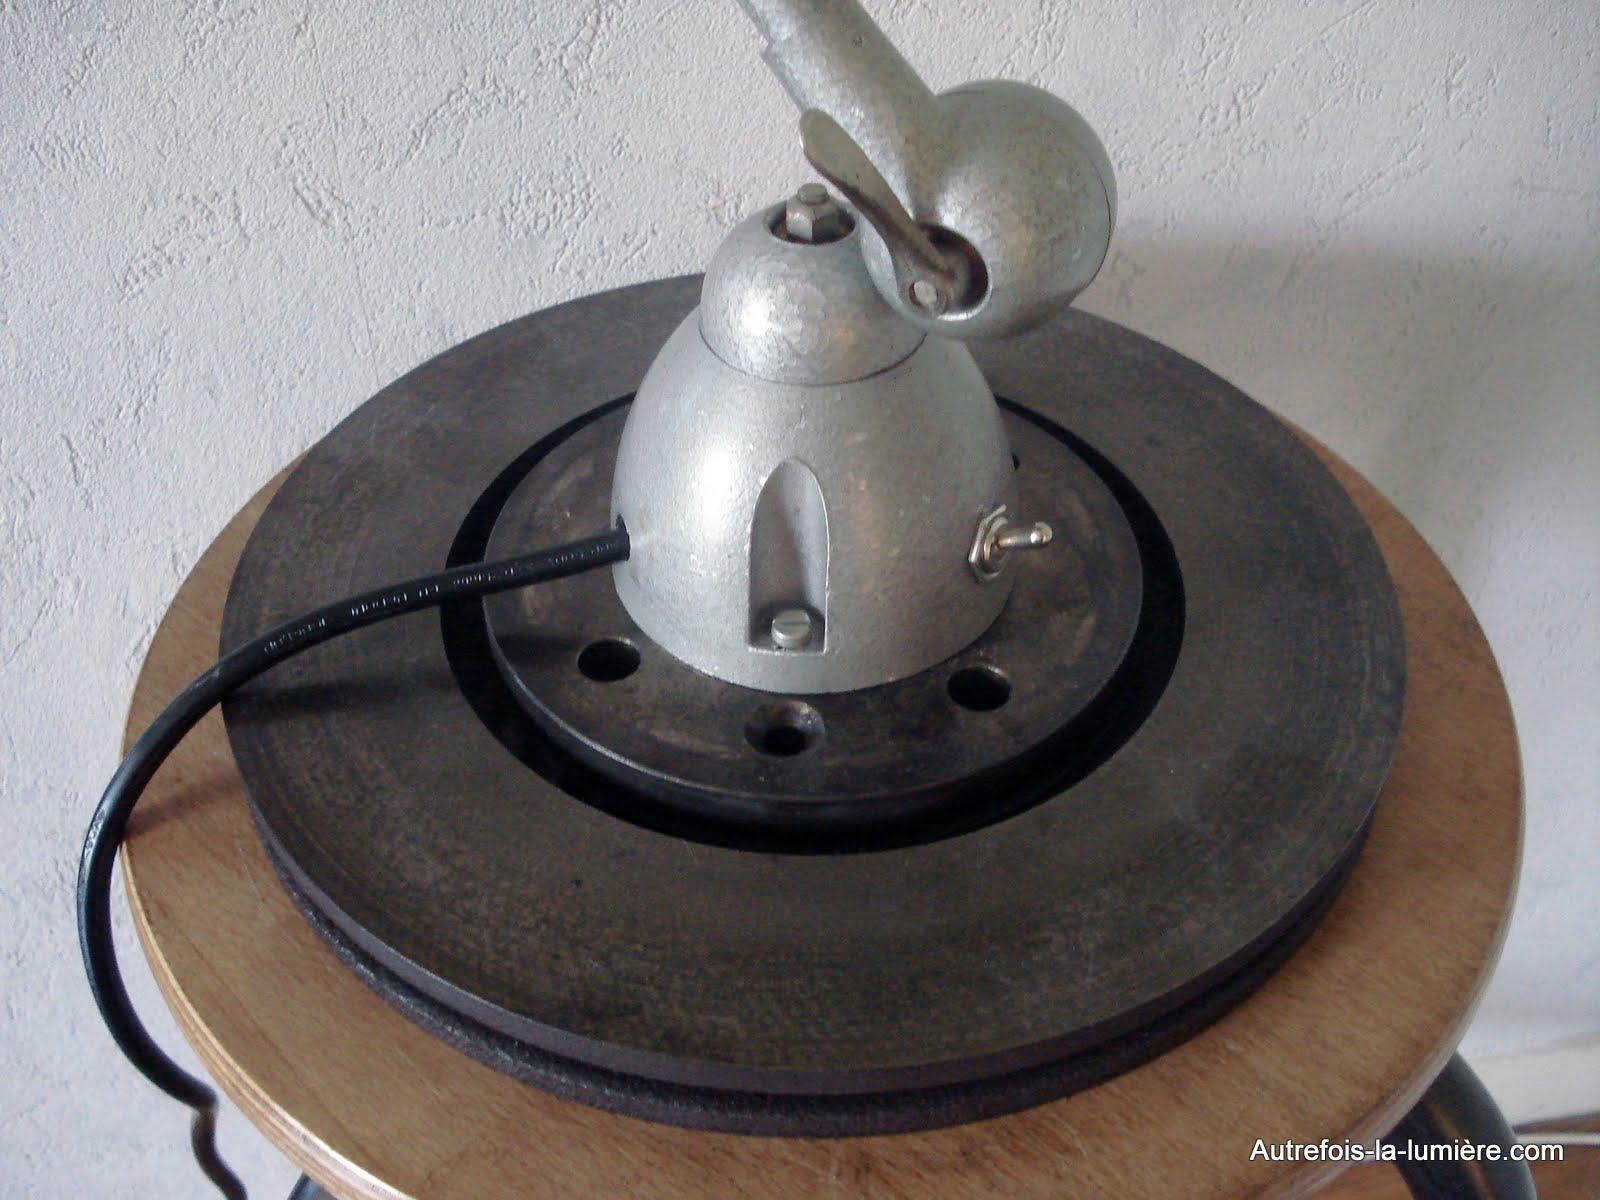 Lampe industrielle articul e - Lampe industrielle d occasion ...